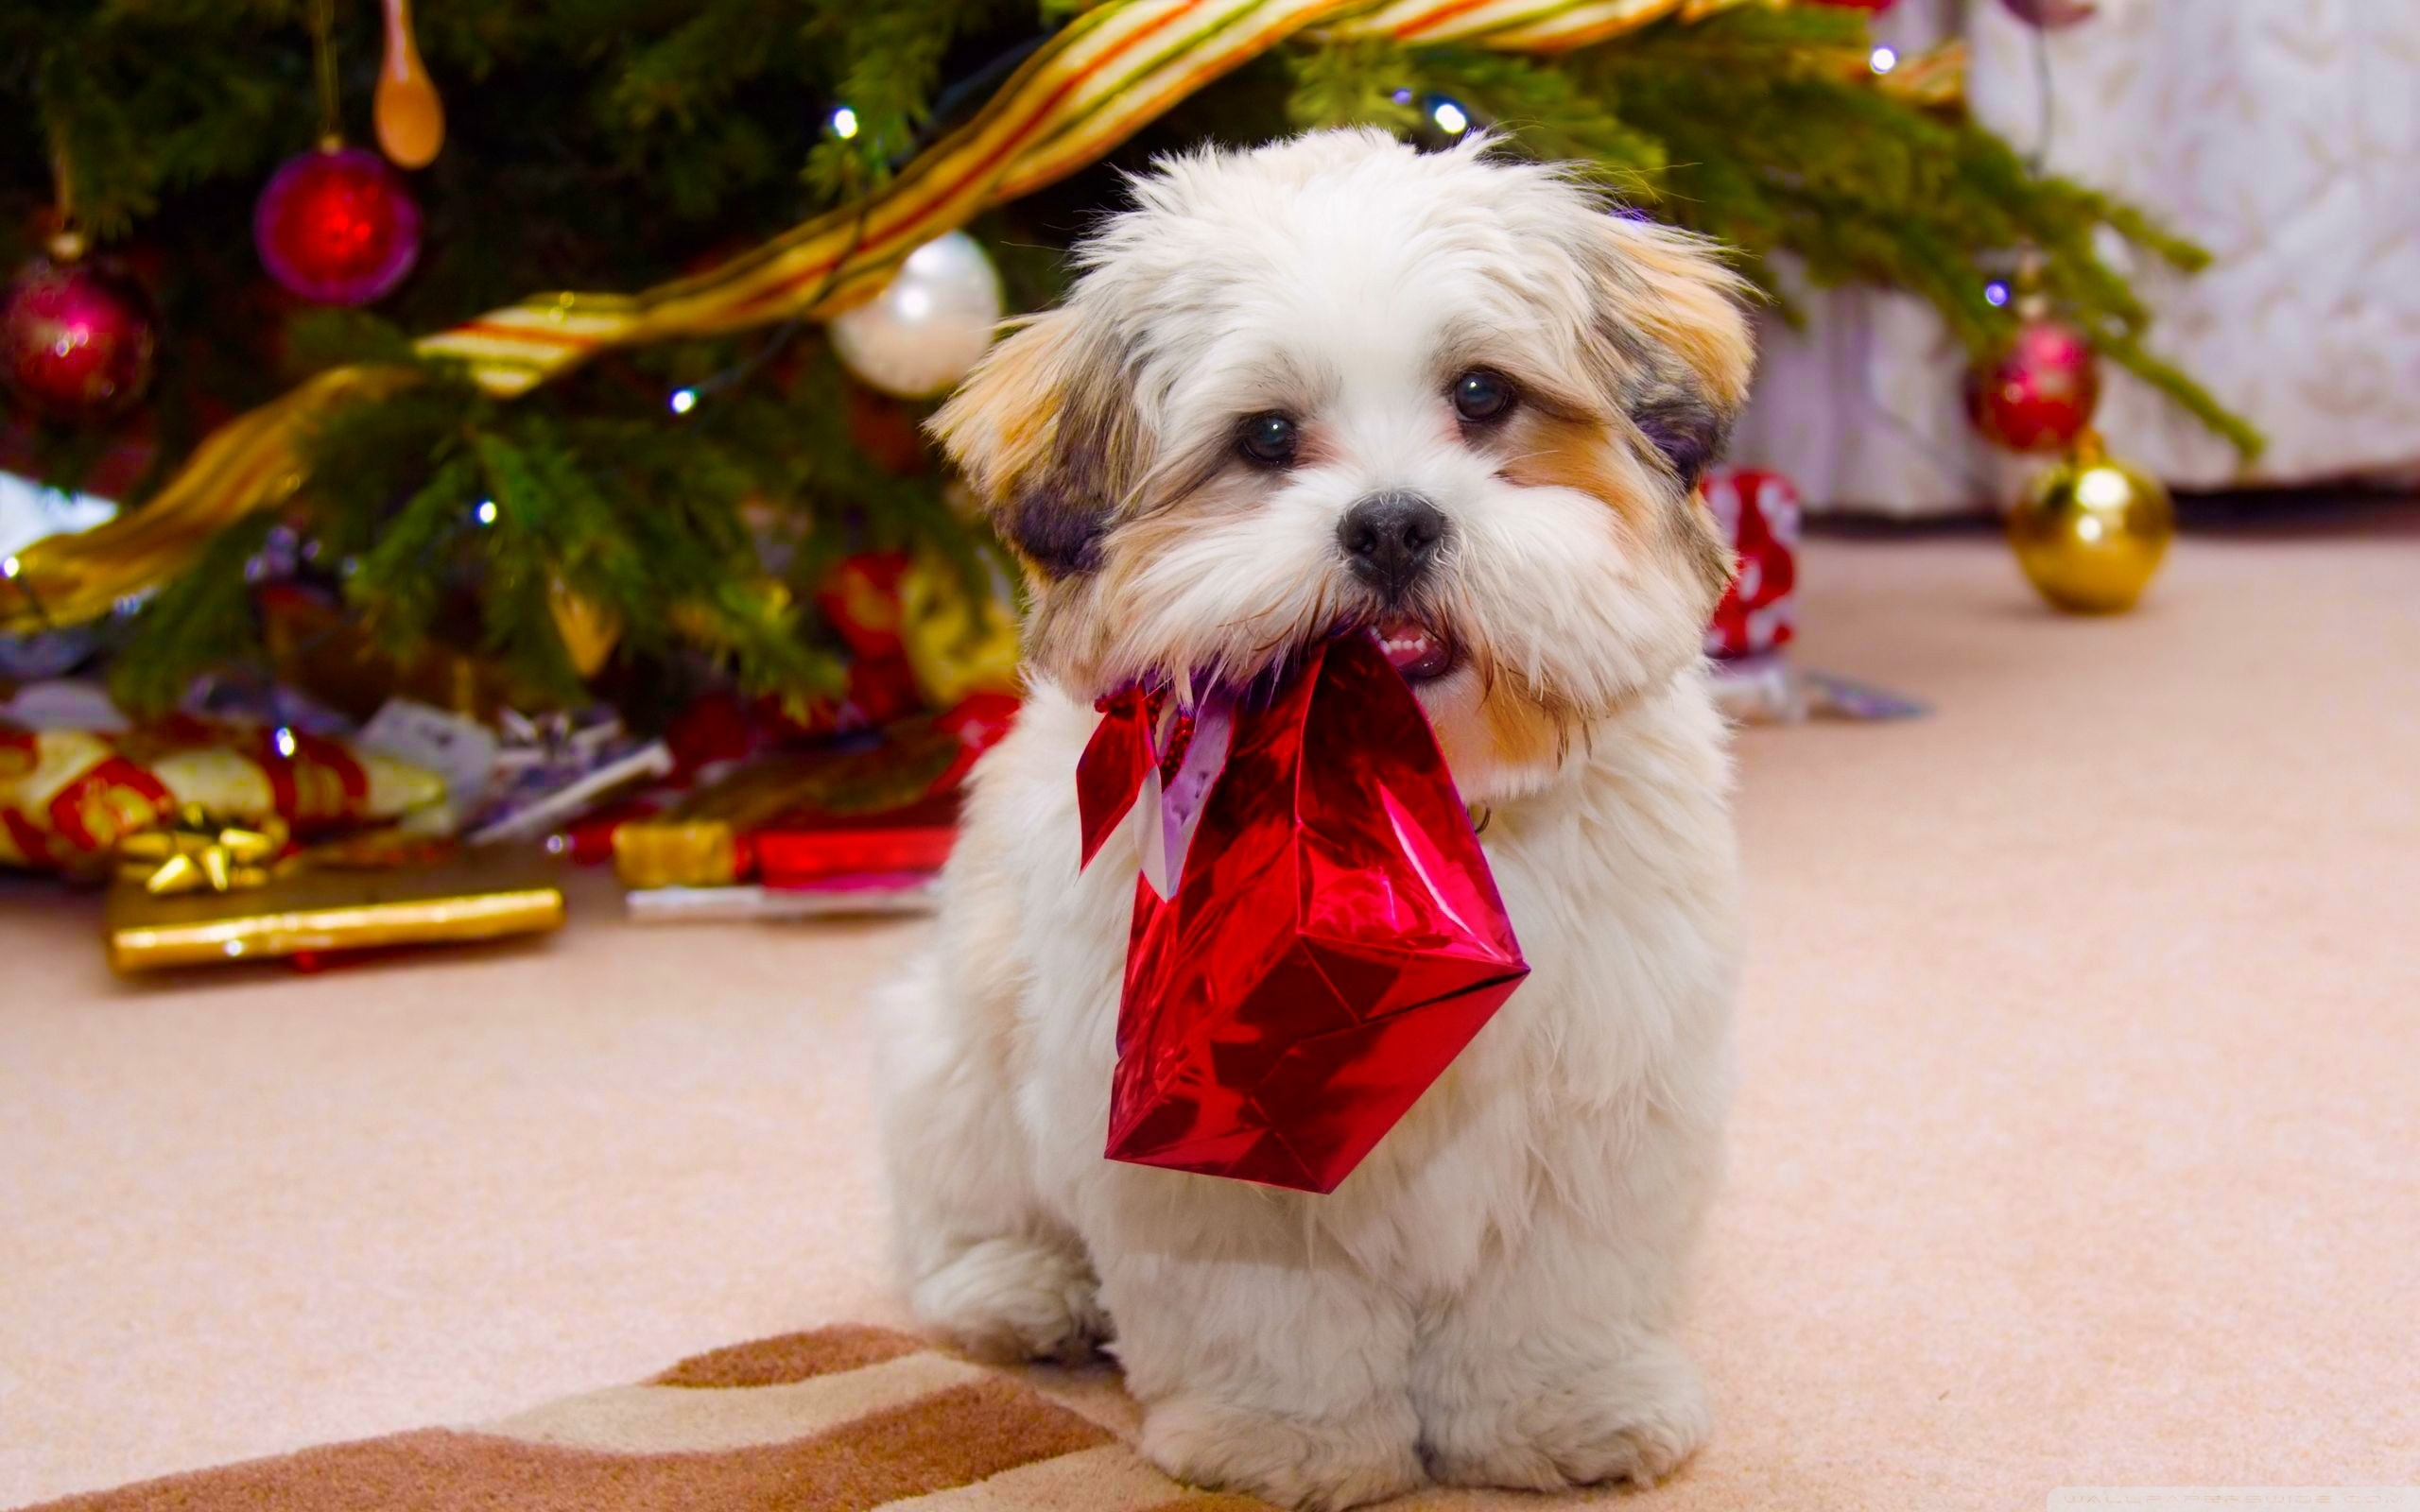 cute dog christmas ❤ 4k hd desktop wallpaper for 4k ultra hd tv